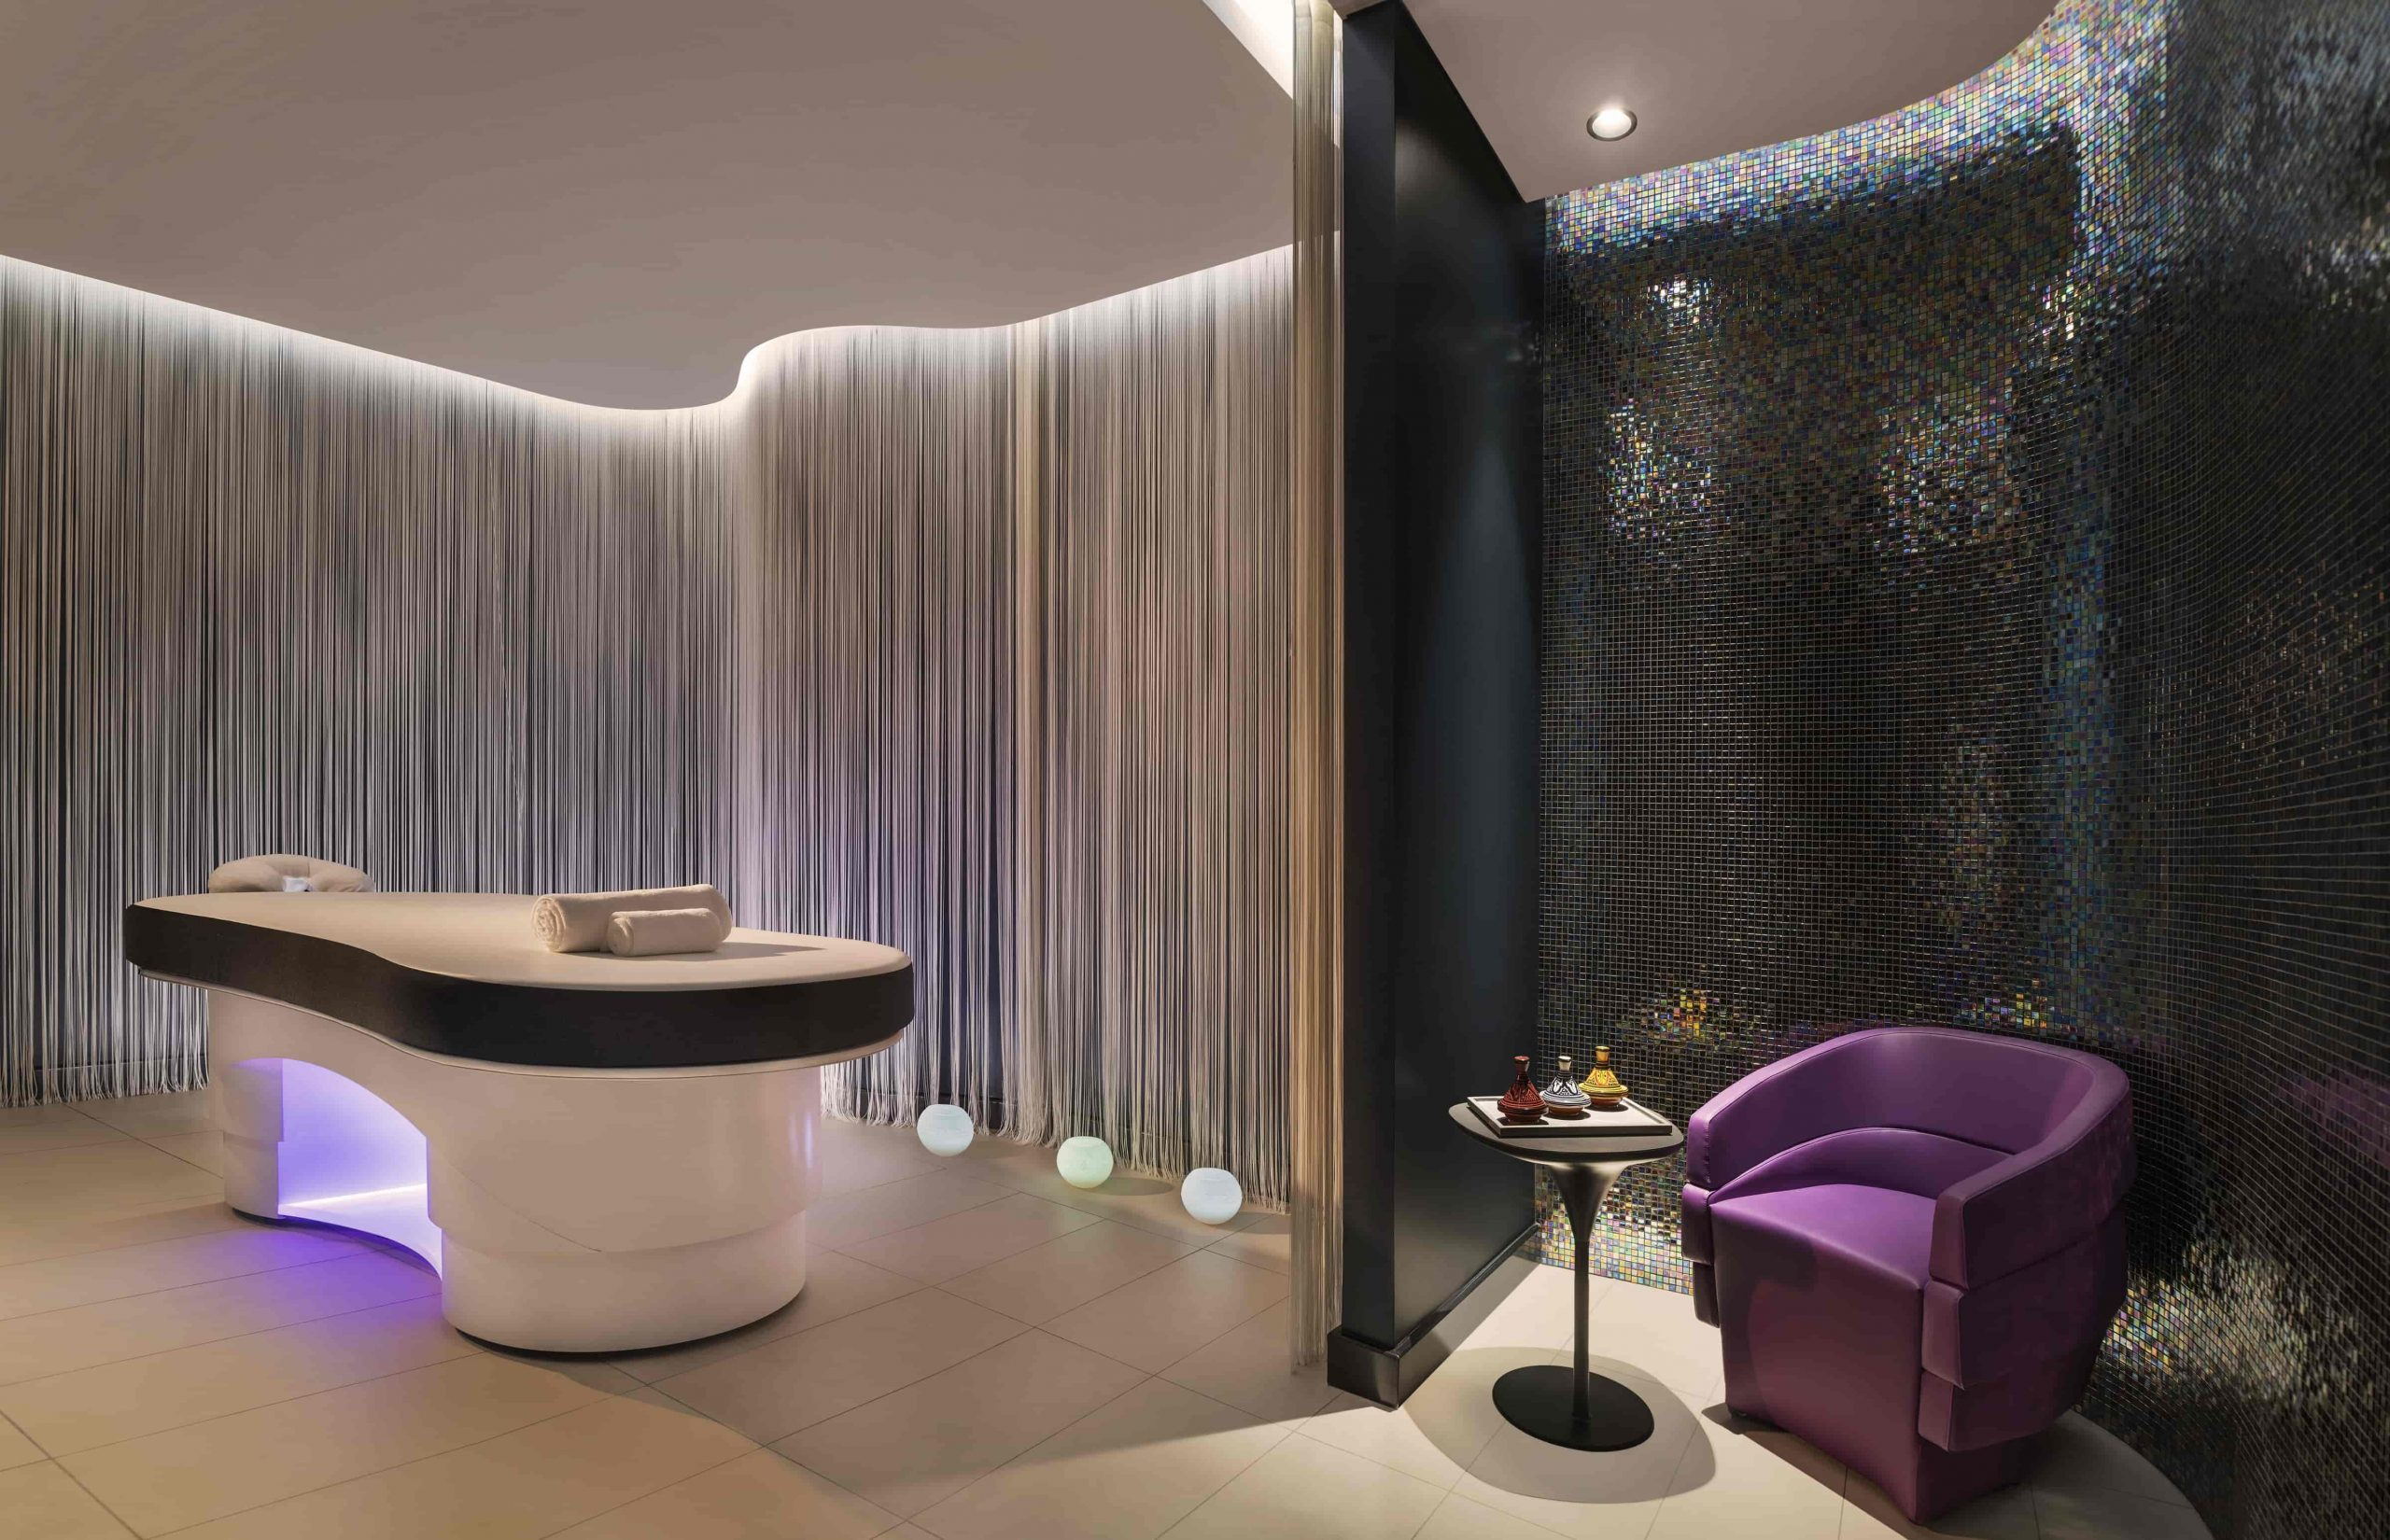 AWAY Spa Dubai